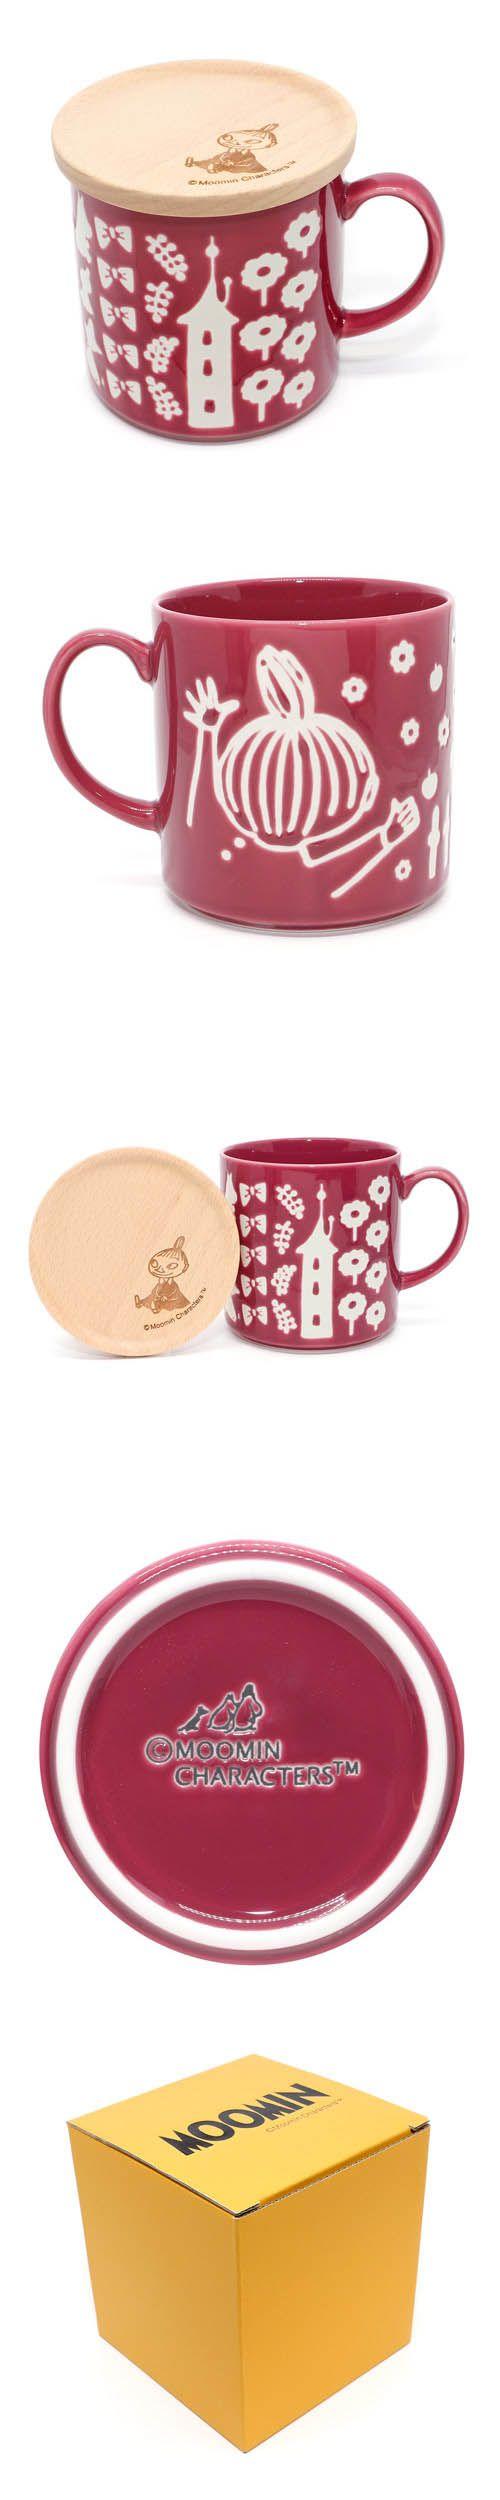 Muumi Moomin Valley Ami red ceramic mug wooden lid box set by YamaKa  KawaMono.com